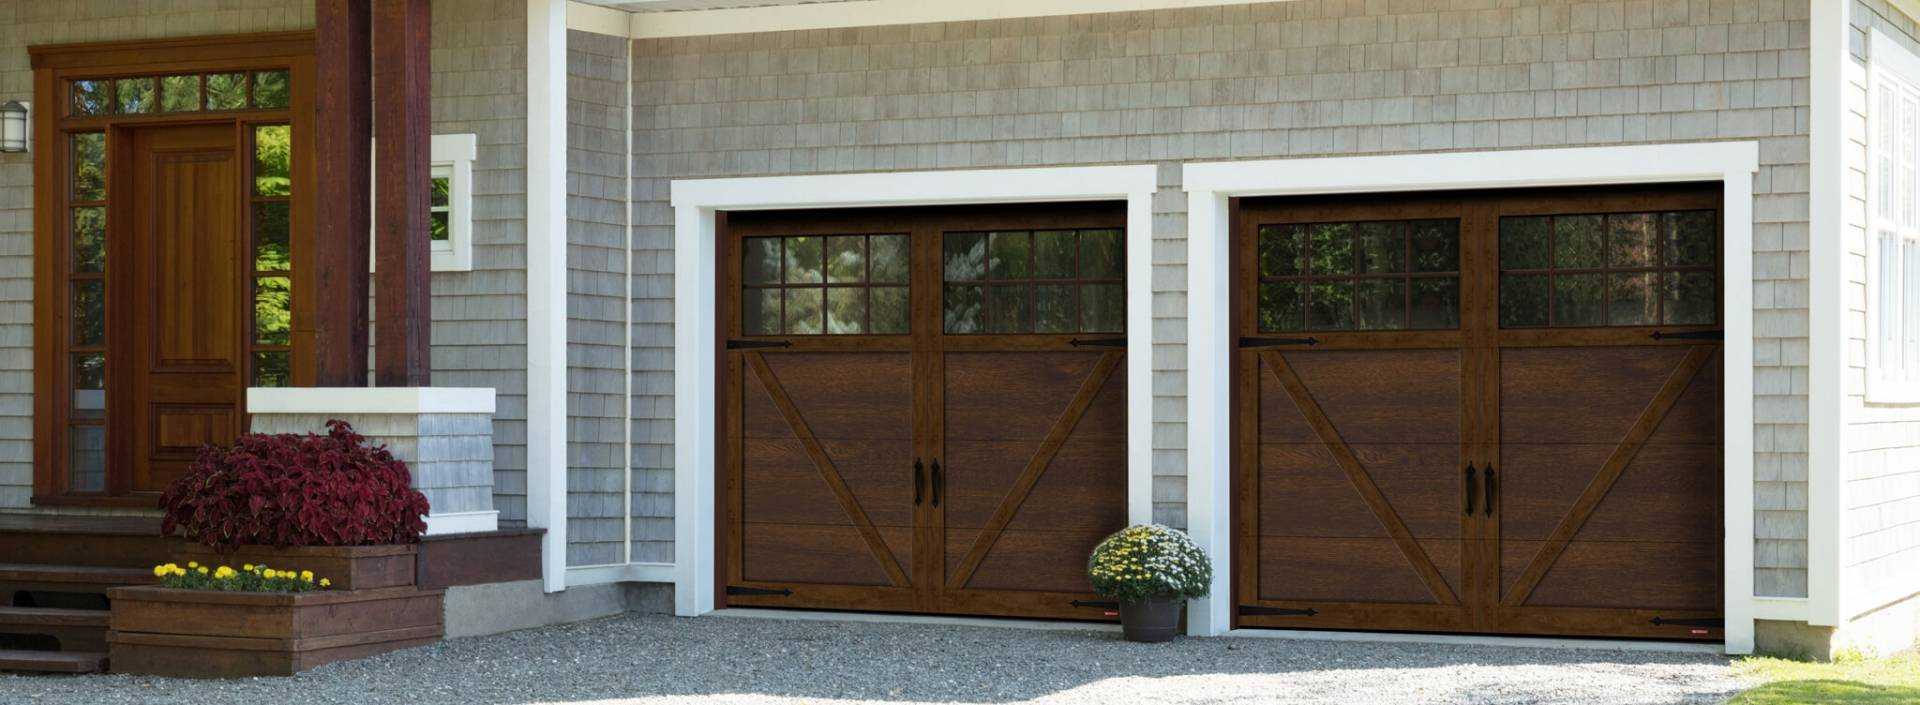 Princeton P-23 8\u0027 x 7\u0027 Chocolate Walnut door and overlays & Garage doors \u0026 openers by Garaga® | The industry leader in quality